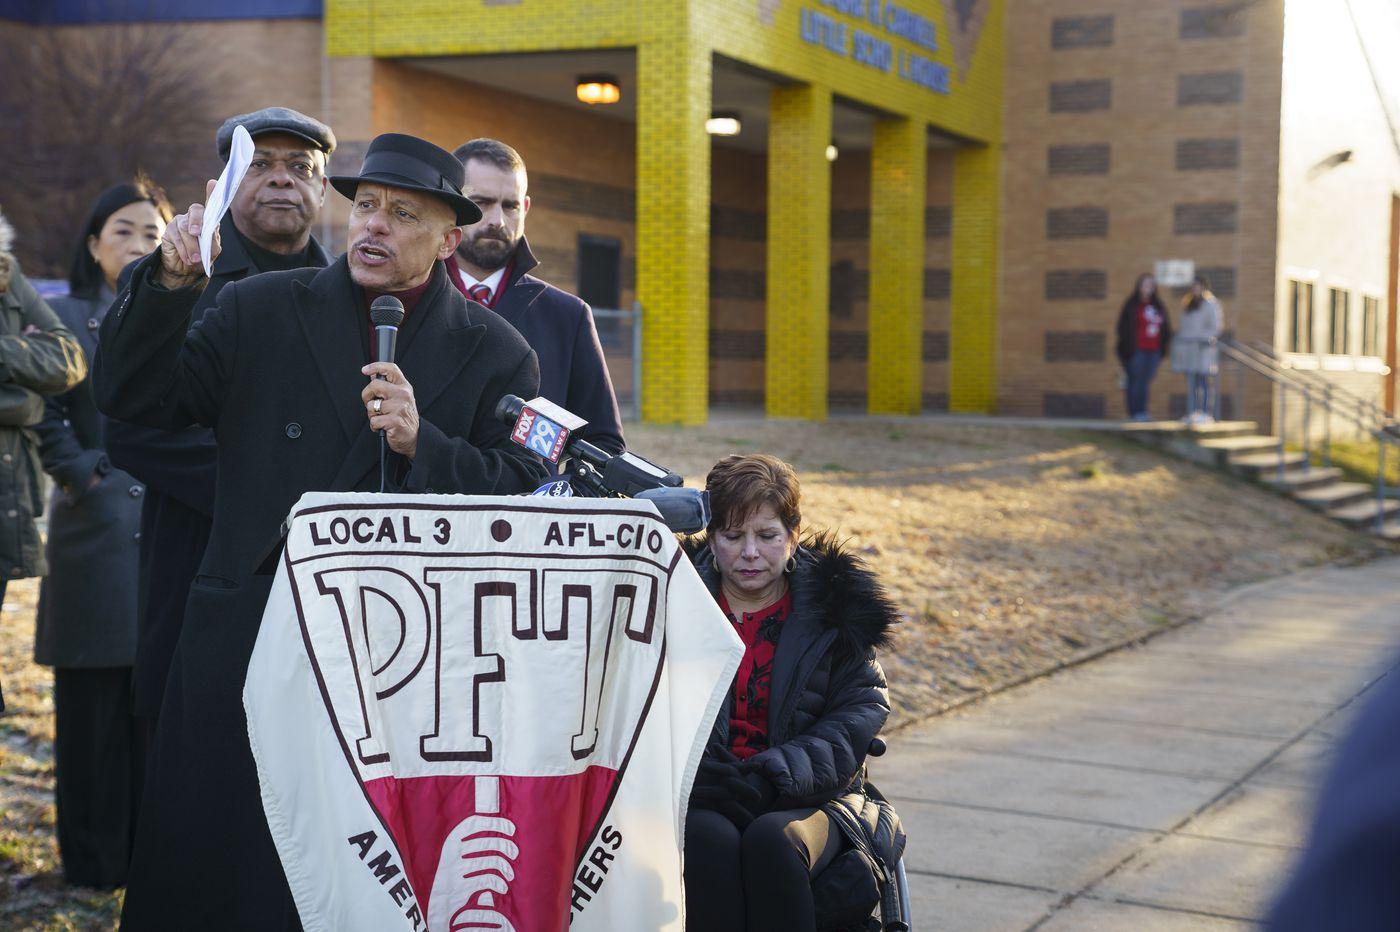 Philadelphia wants money from Pennsylvania to deal with dangerous asbestos in schools